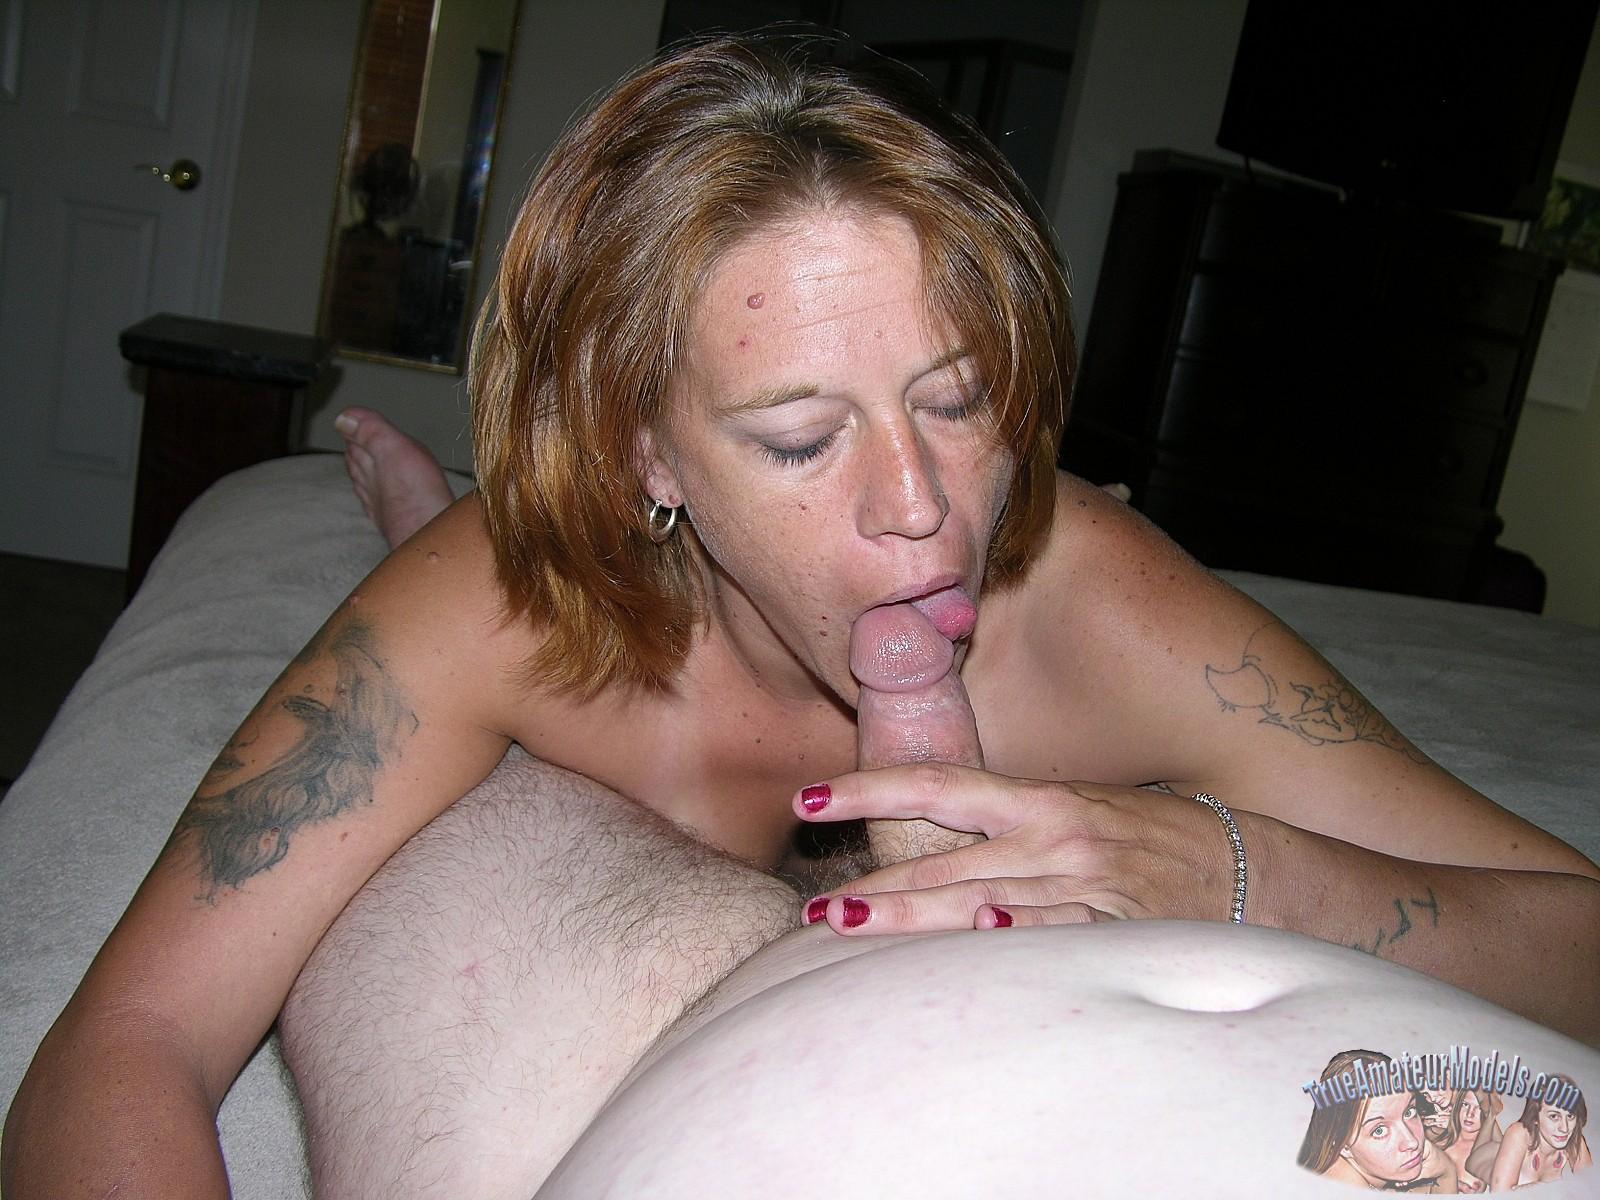 Lisa valintine pornstar